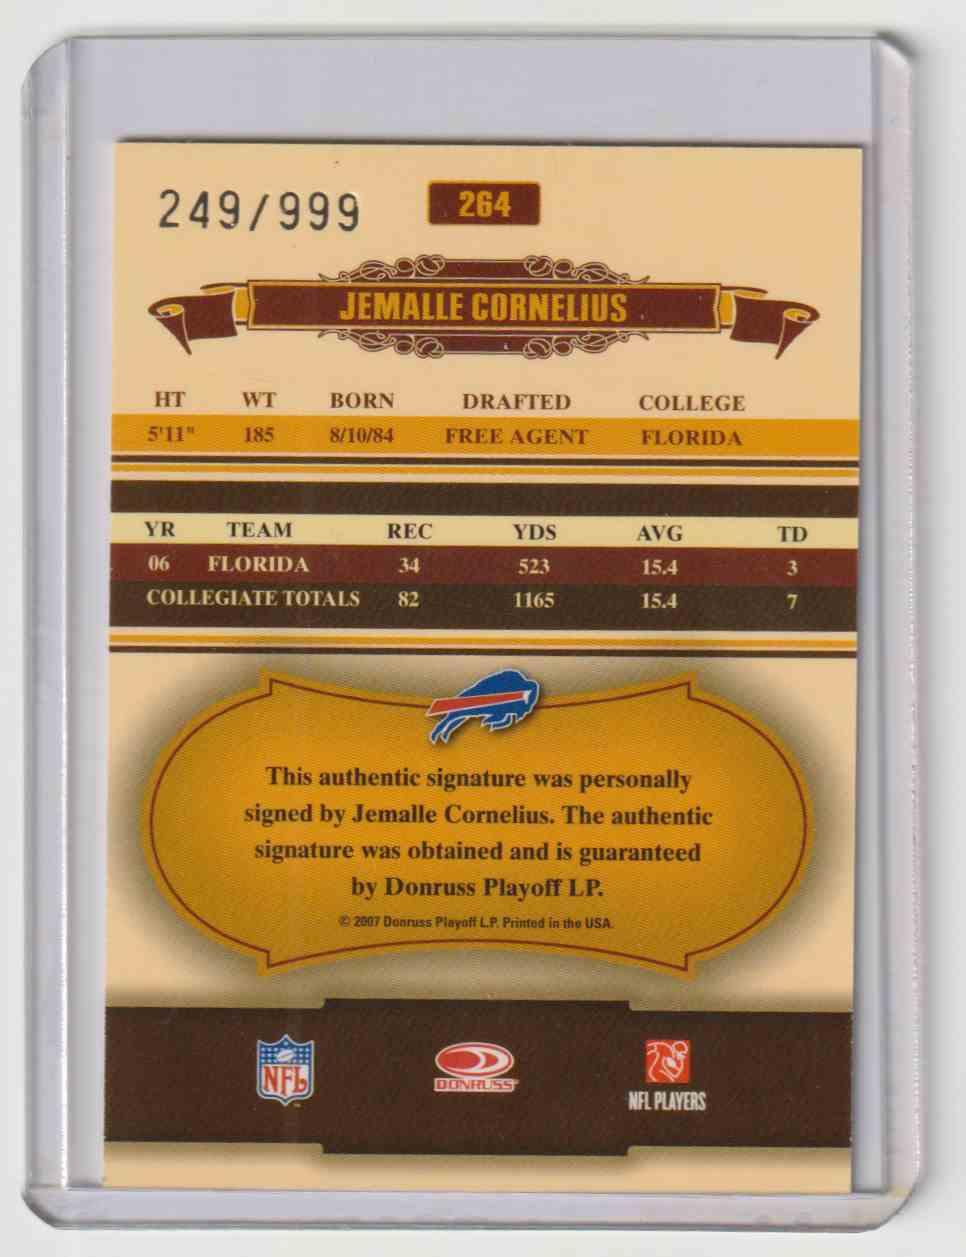 2007 Donruss Classics Jemalle Cornelius #264 card back image